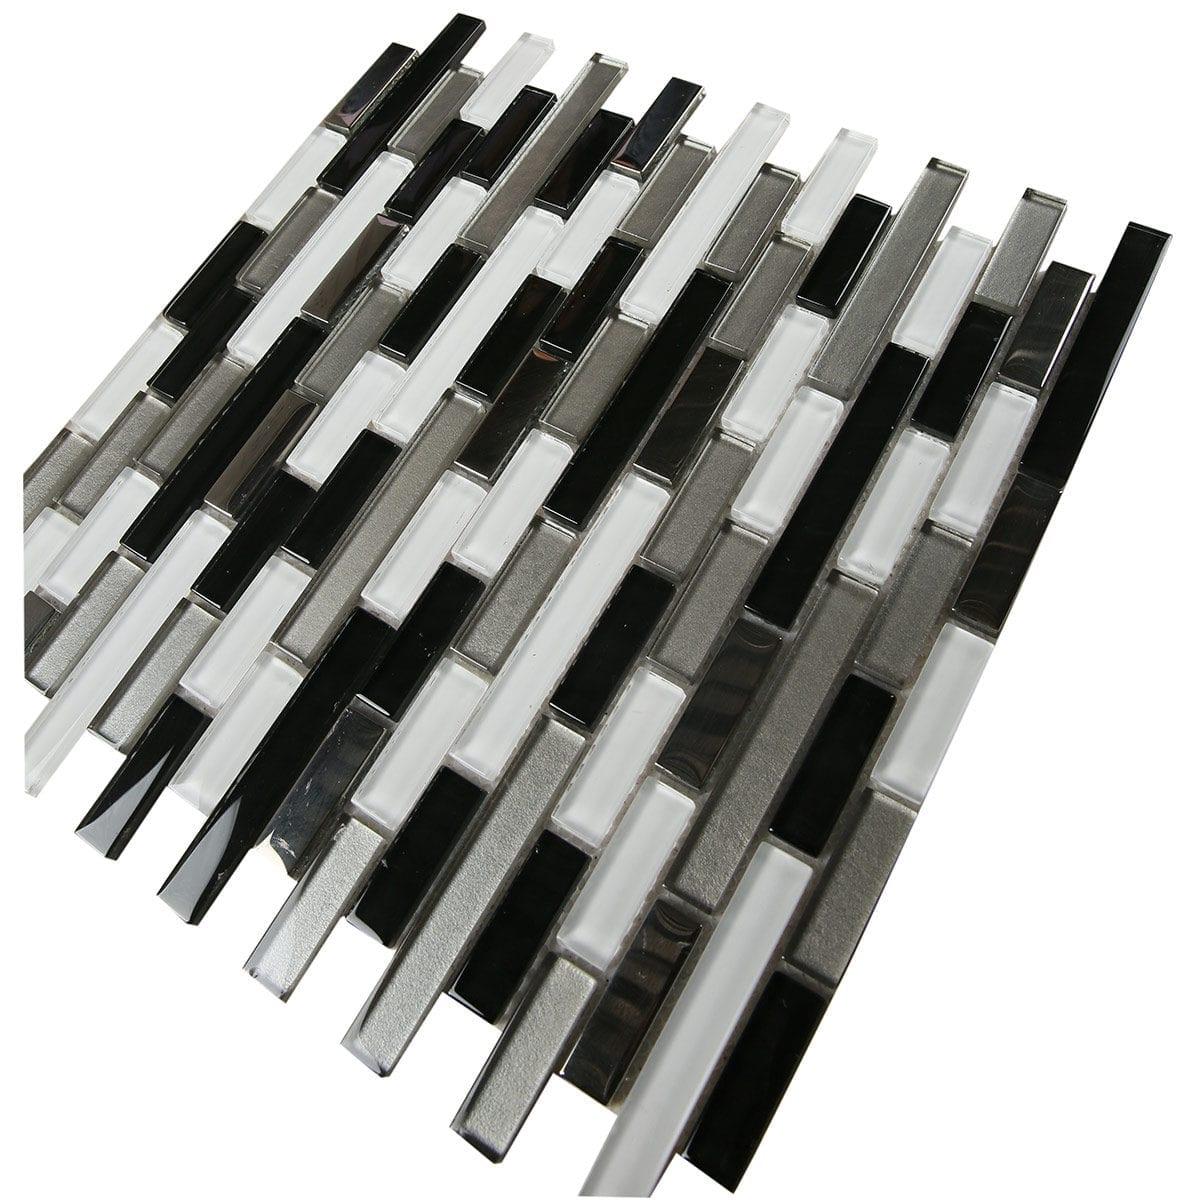 M4T031 1 Brick pattern White grey black metalic finish